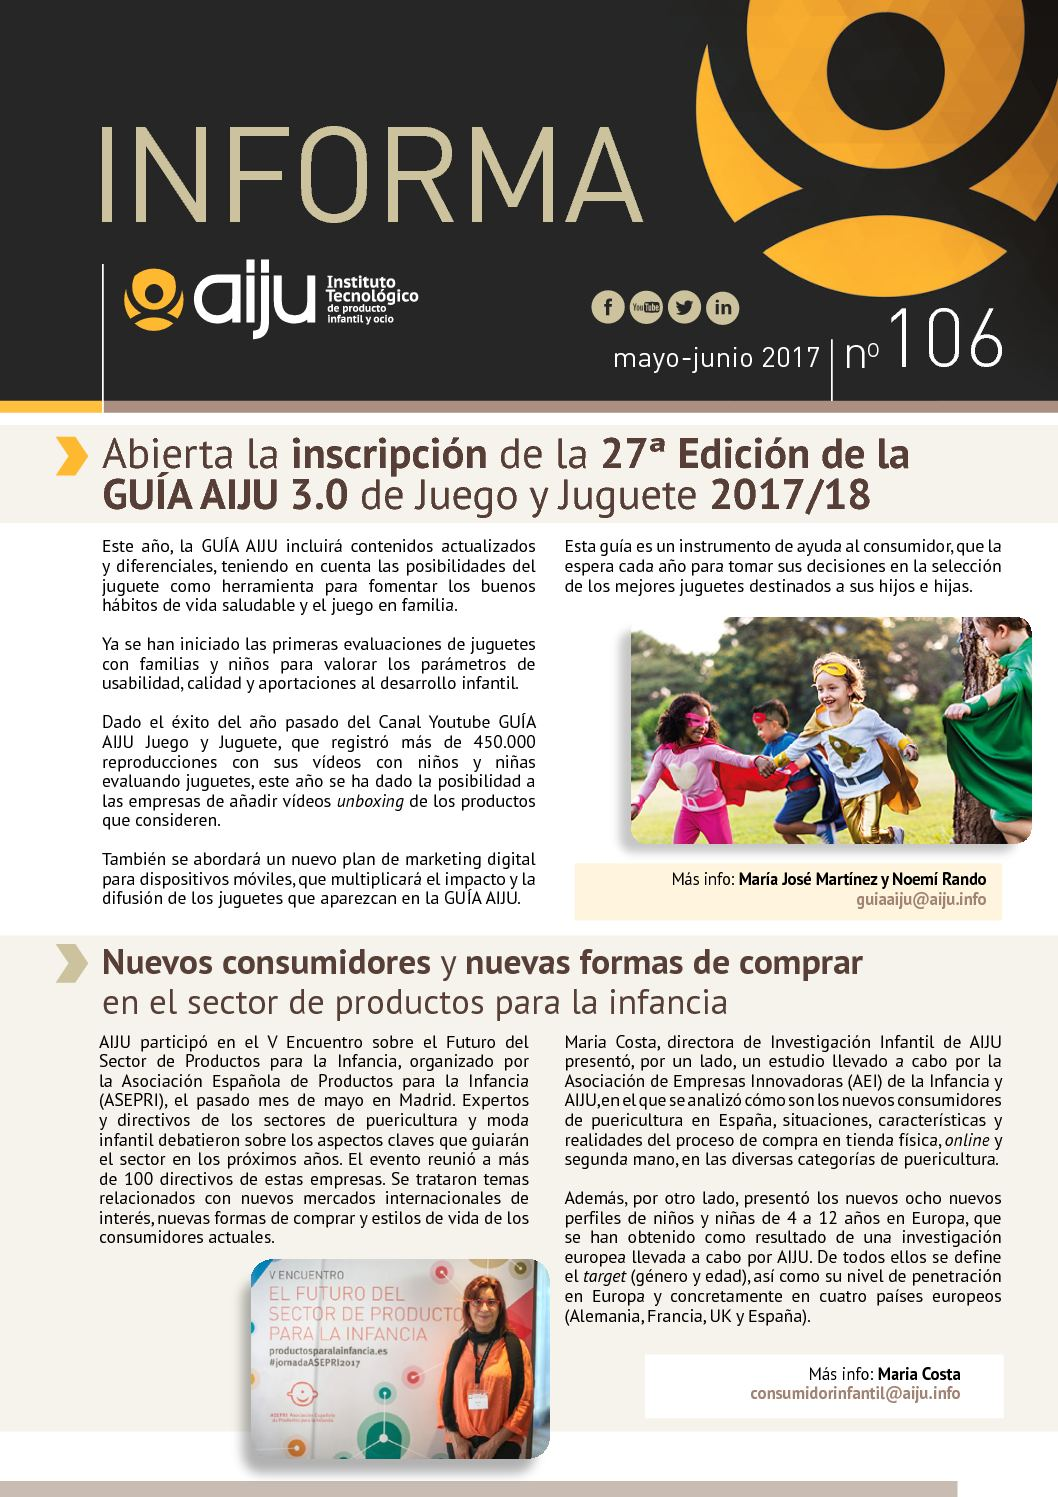 Calaméo - Boletín informativo de Aiju